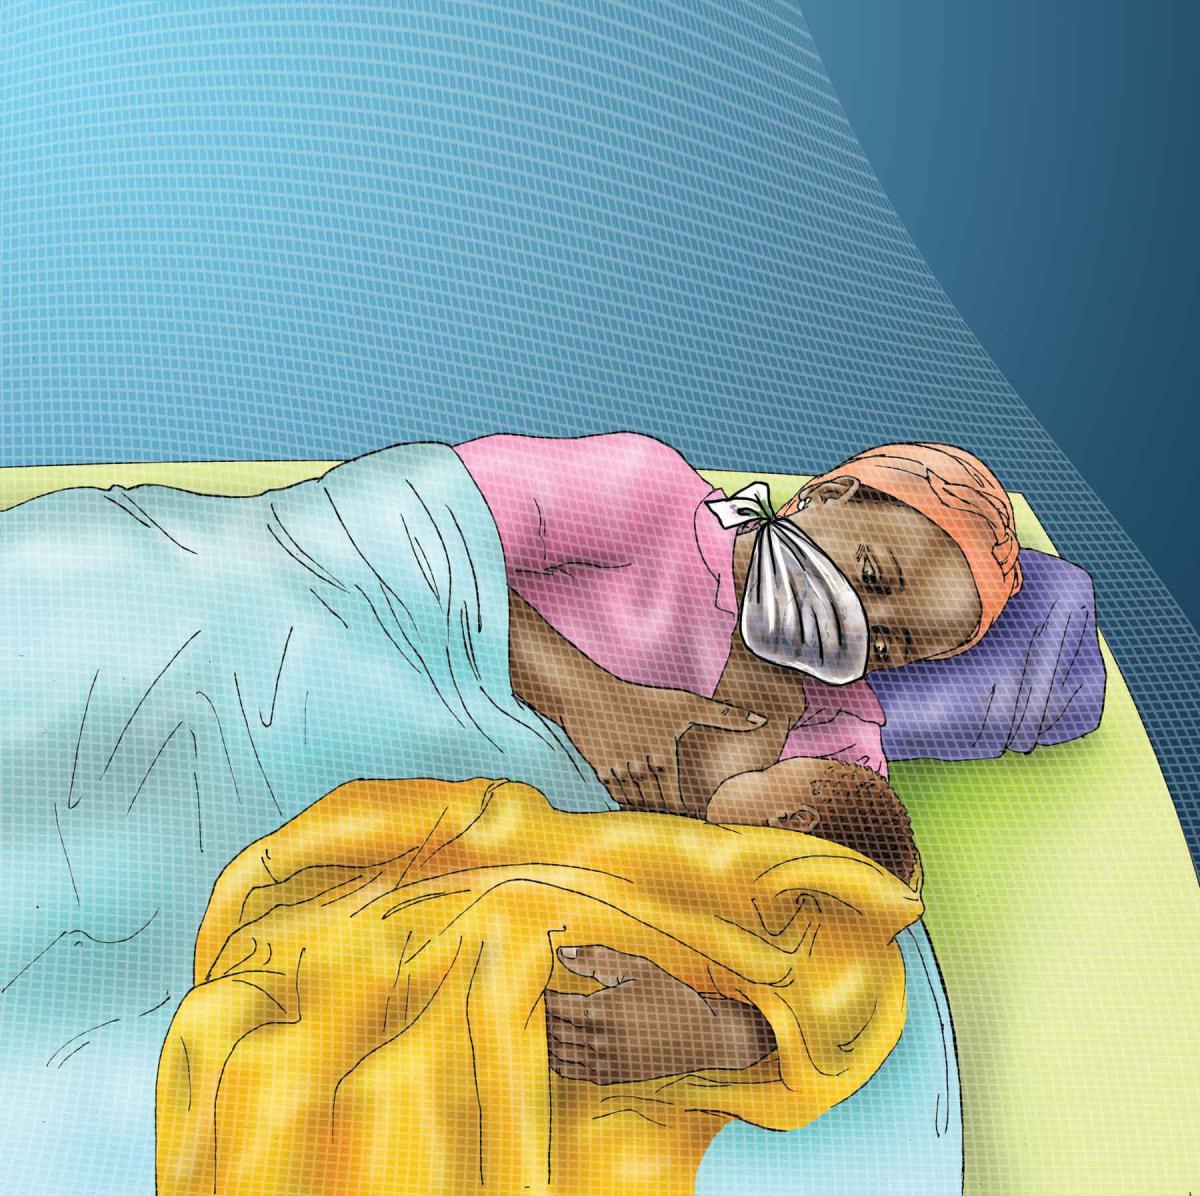 Breastfeeding - Breastfeeding at night - 01 - COVID